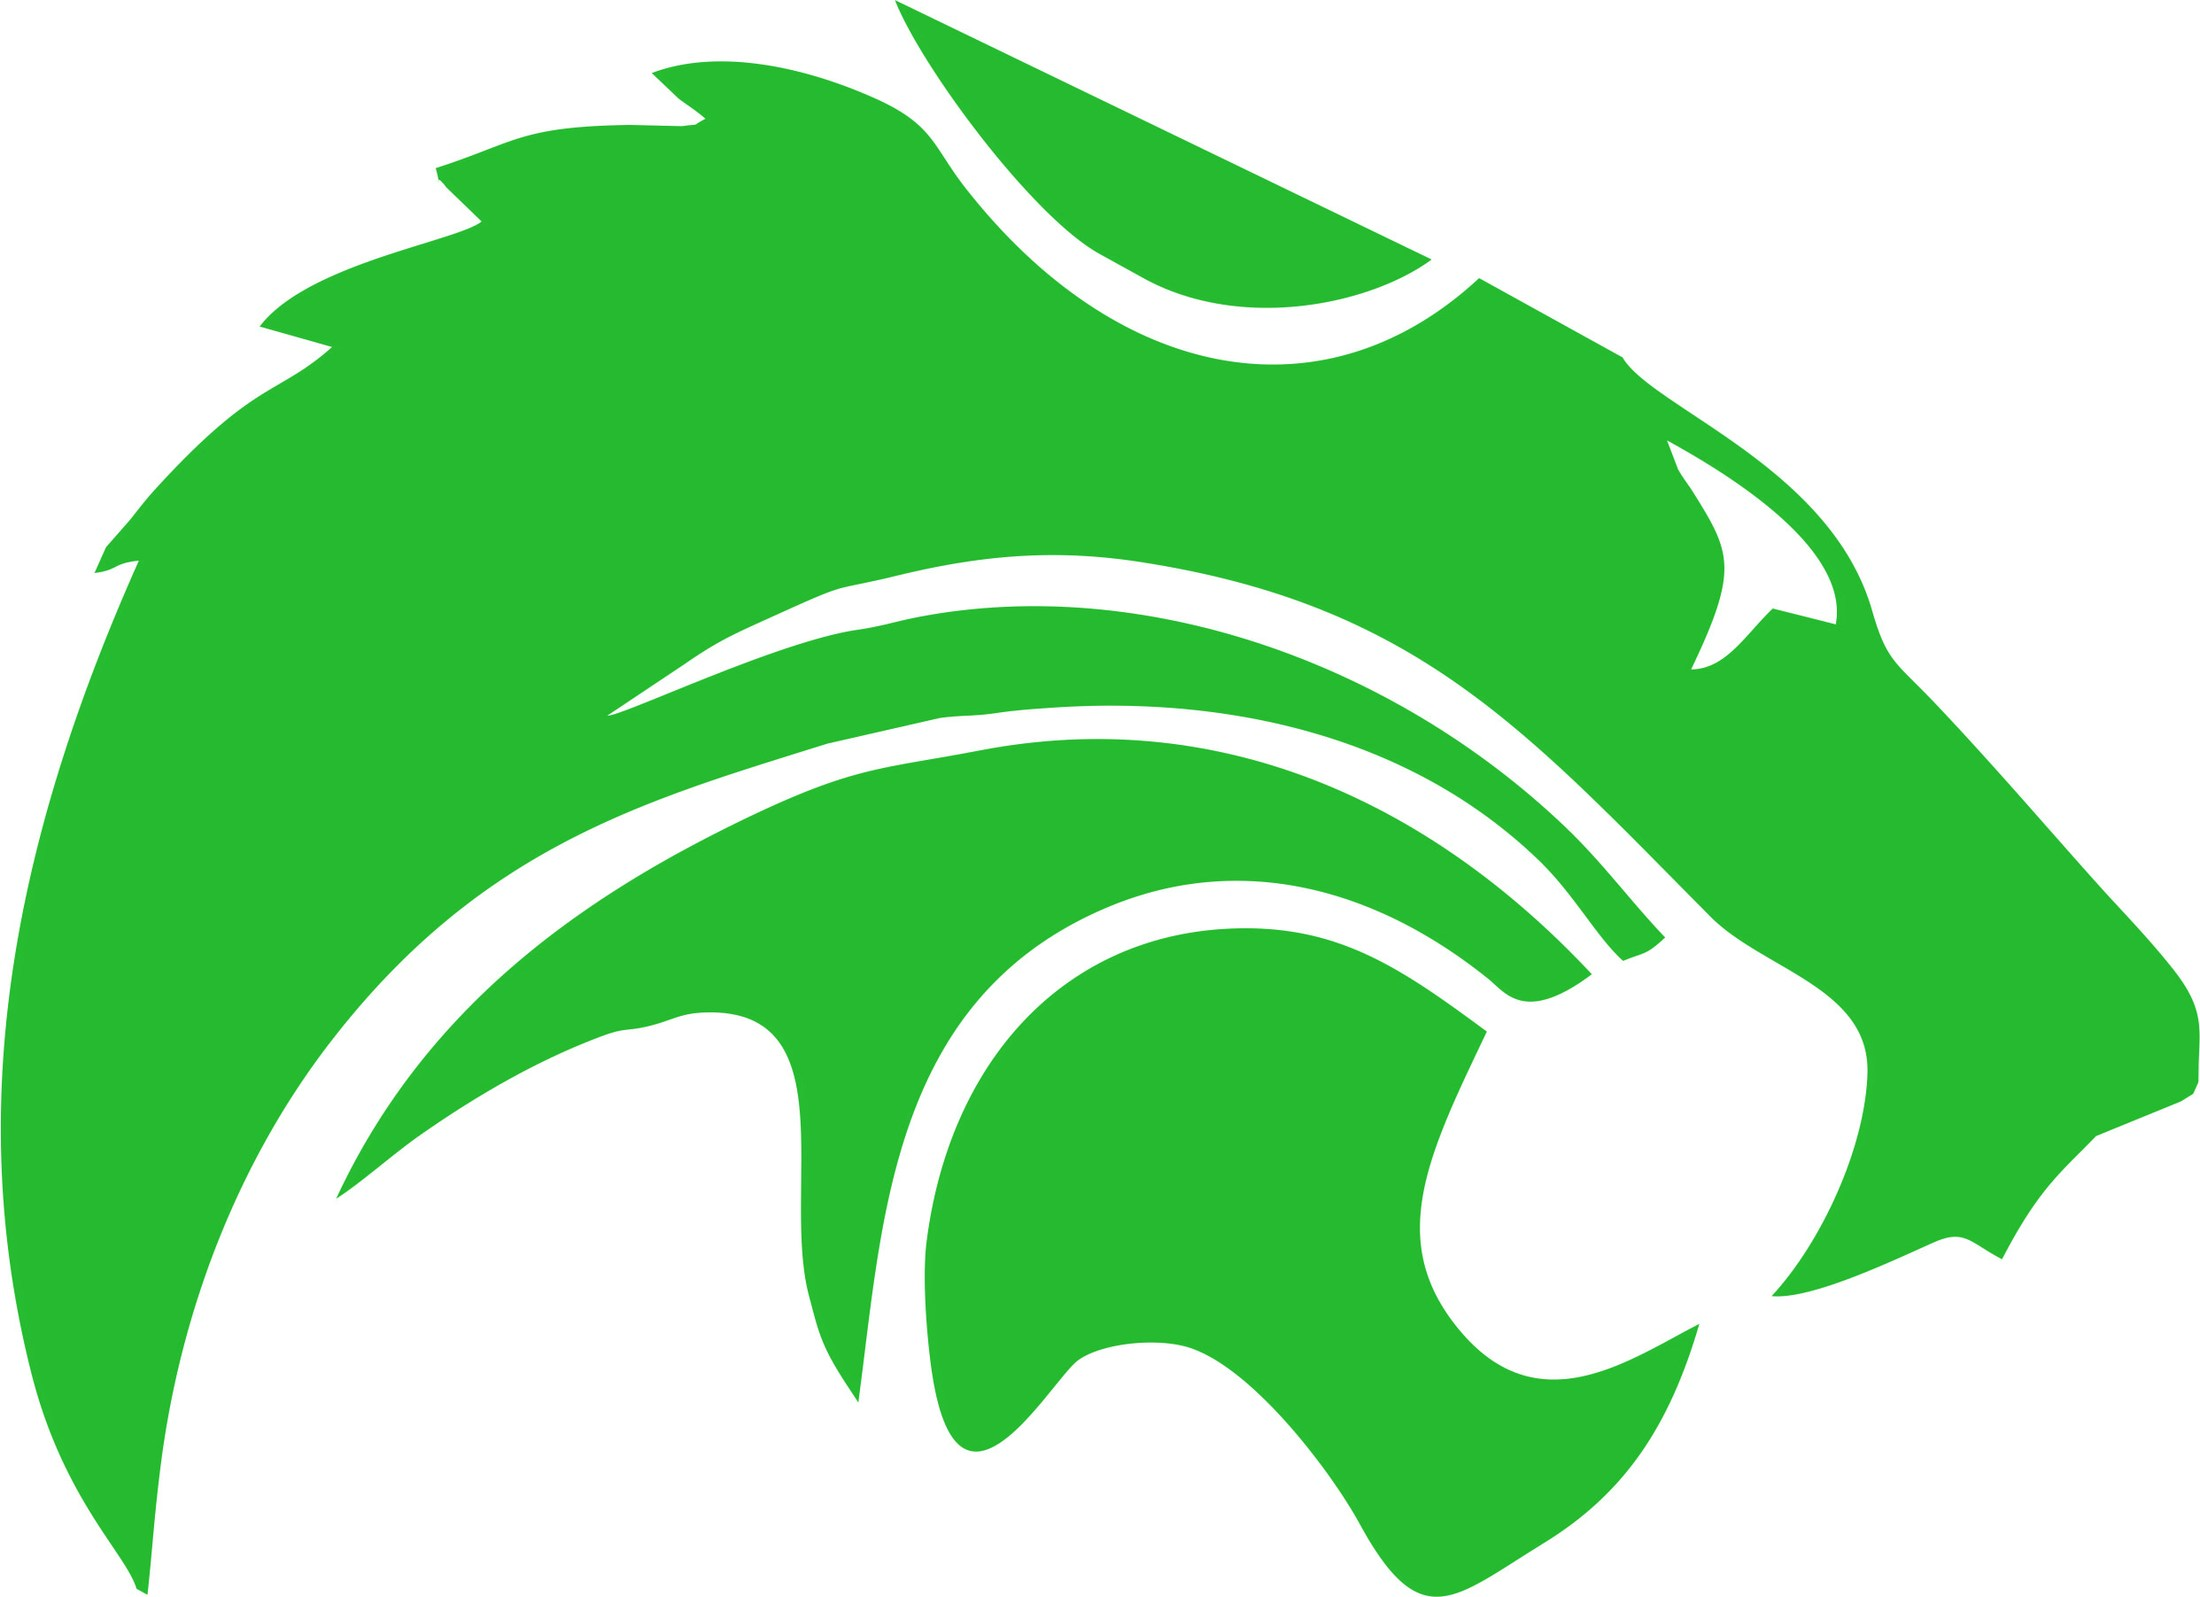 theacademyk12.org Welcome to Wildcat Football! – Glenn Scott – The Academy